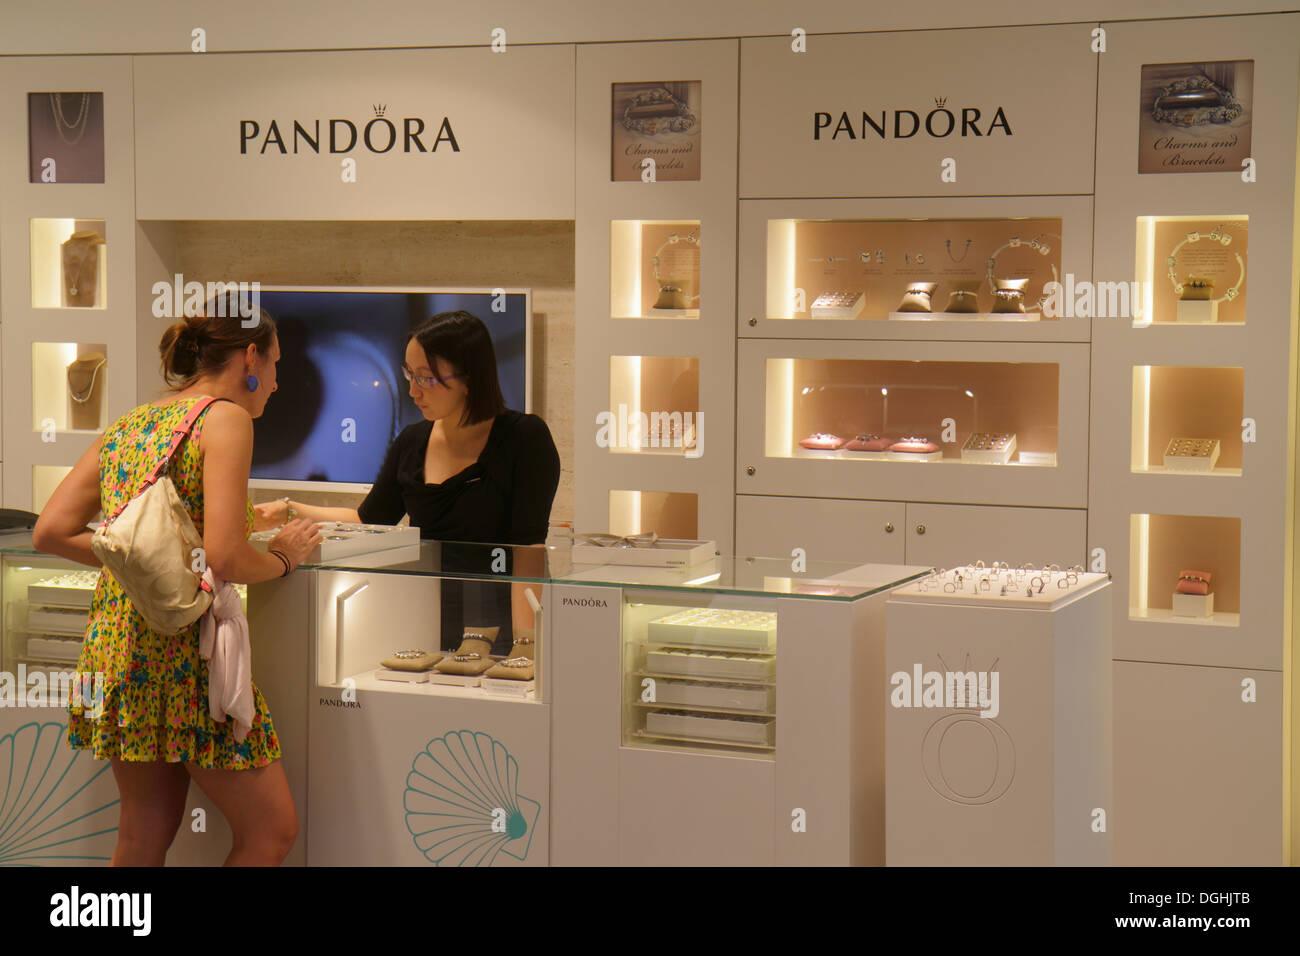 pandora shop paris france